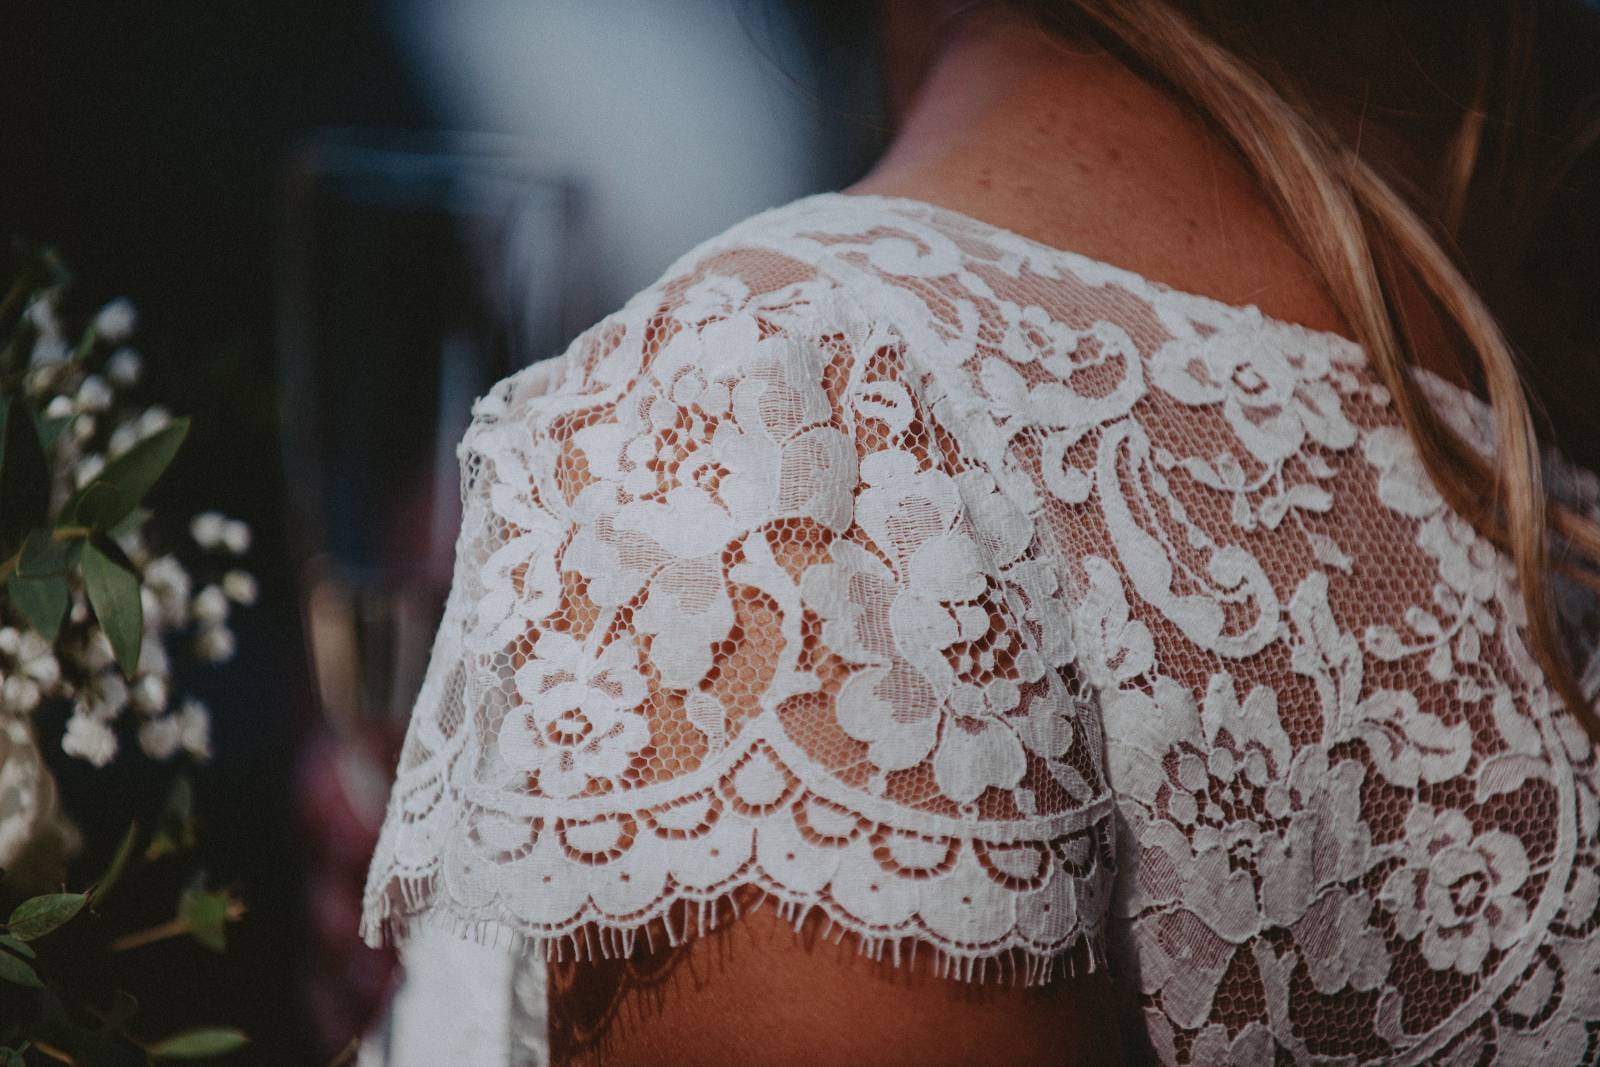 Excellence Weddings - House of Weddings - Aurélien ScArt (5)